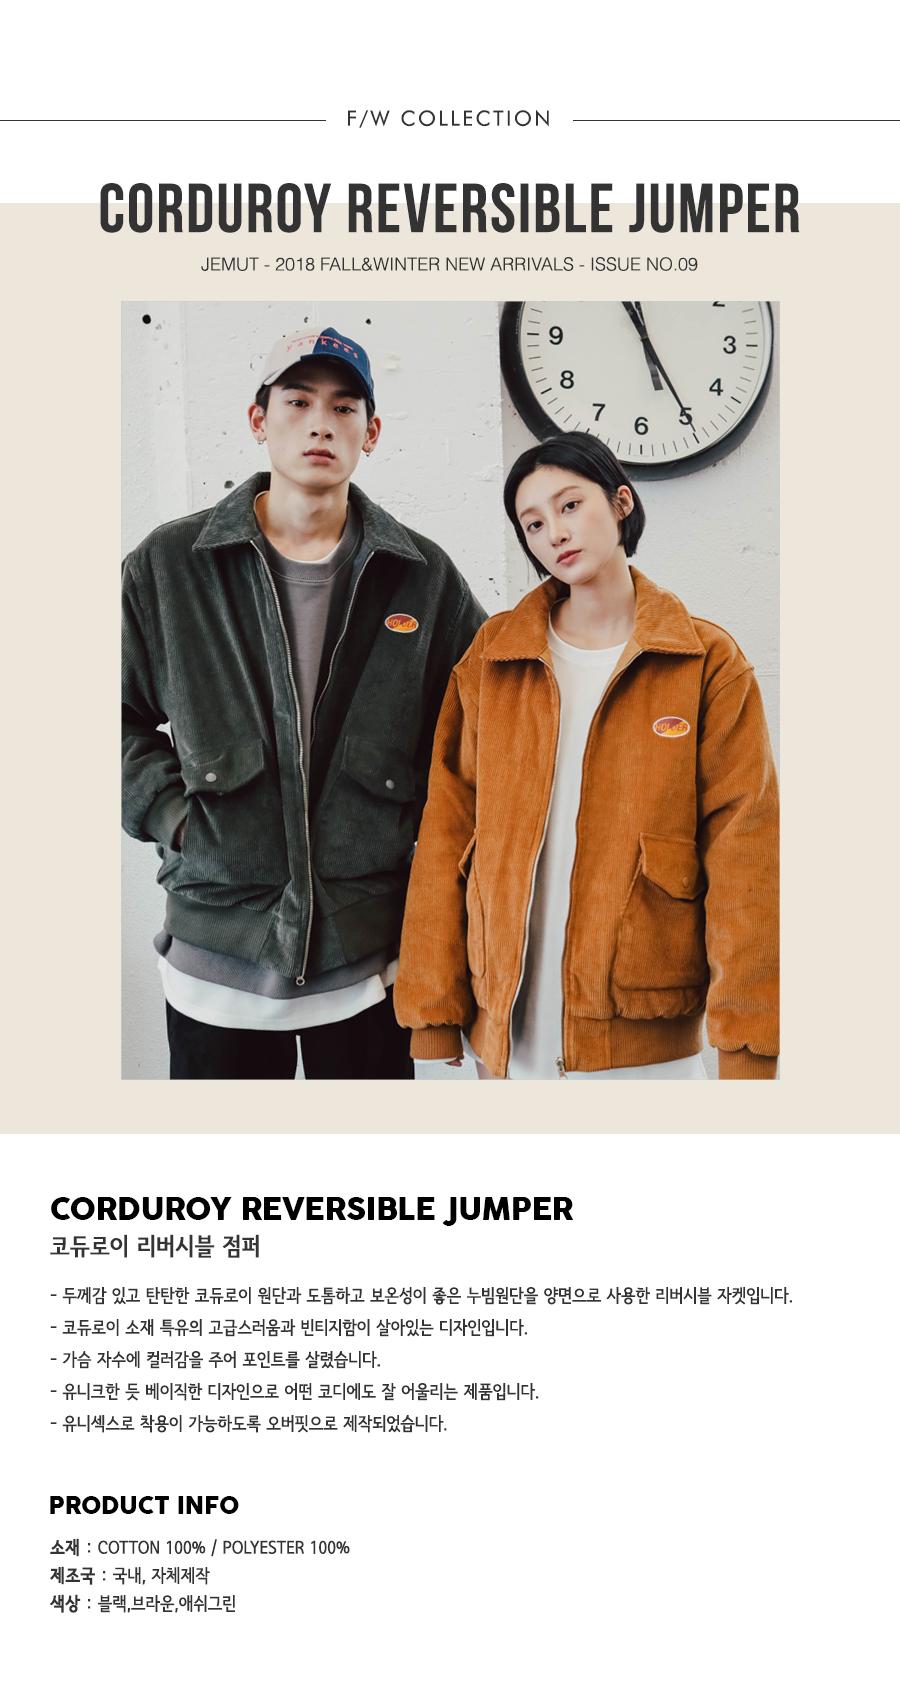 20180904_corduroy_jumper_title_yh.jpg